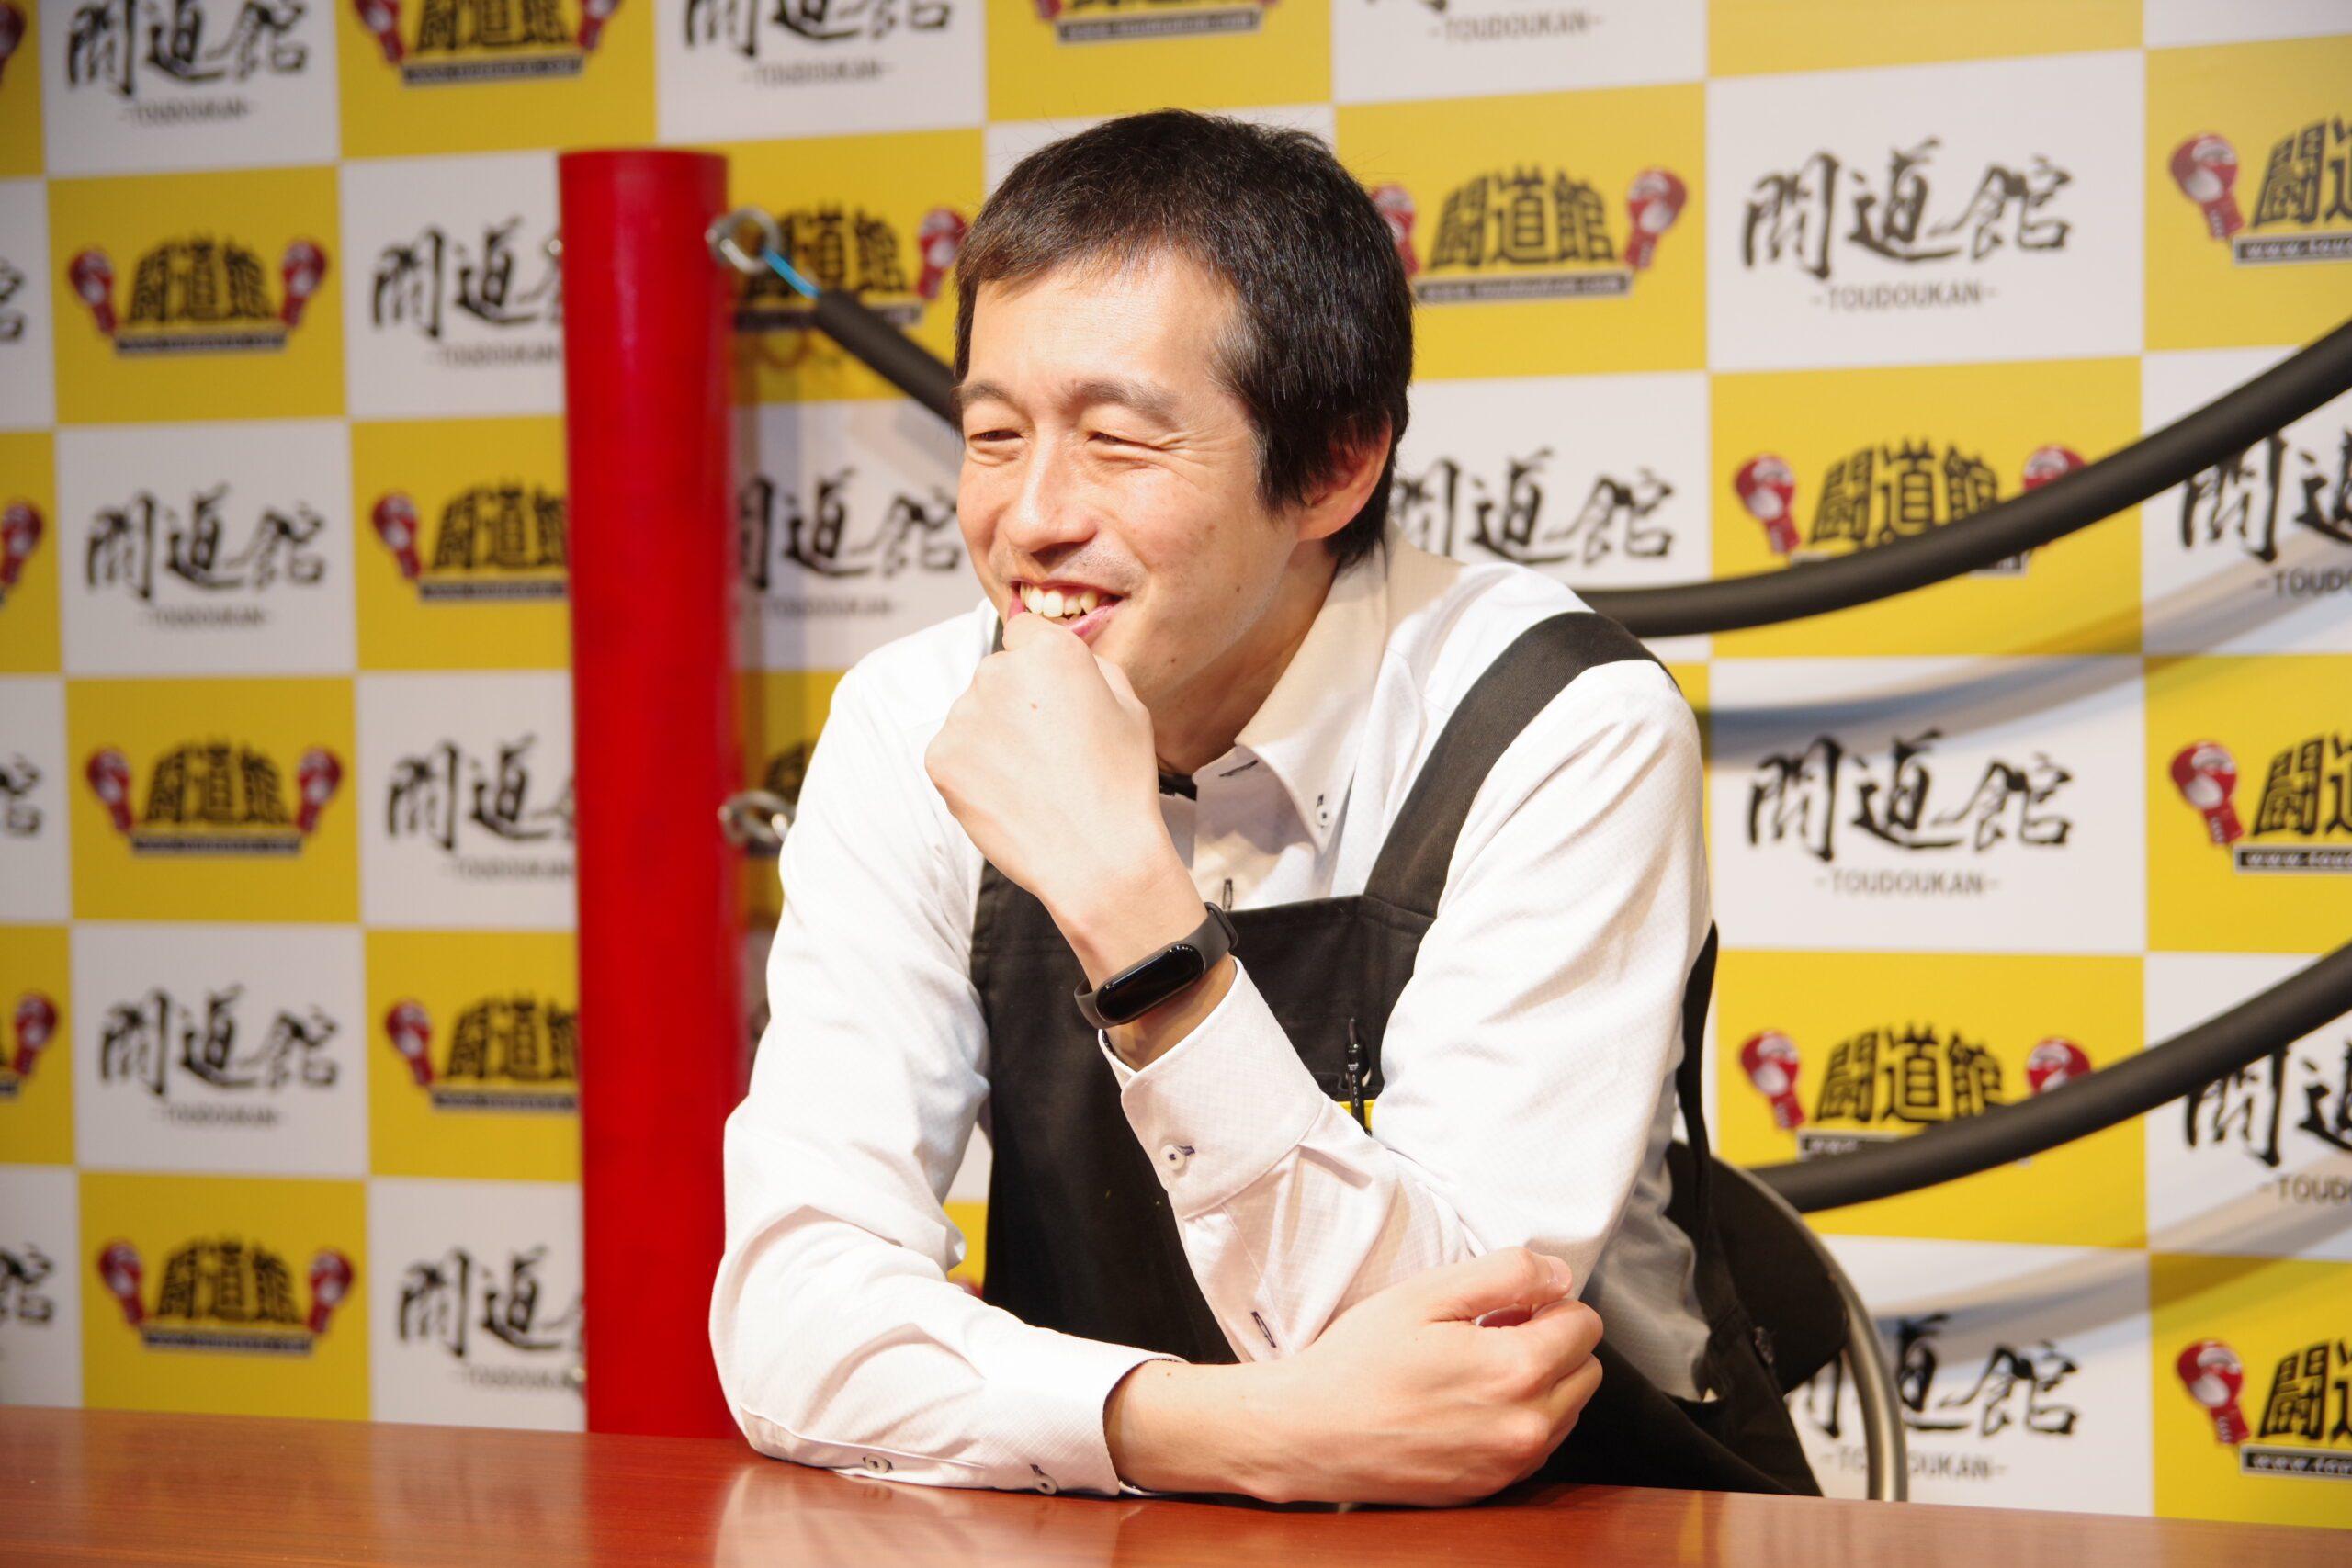 Takashi Izumi Toudoukan events